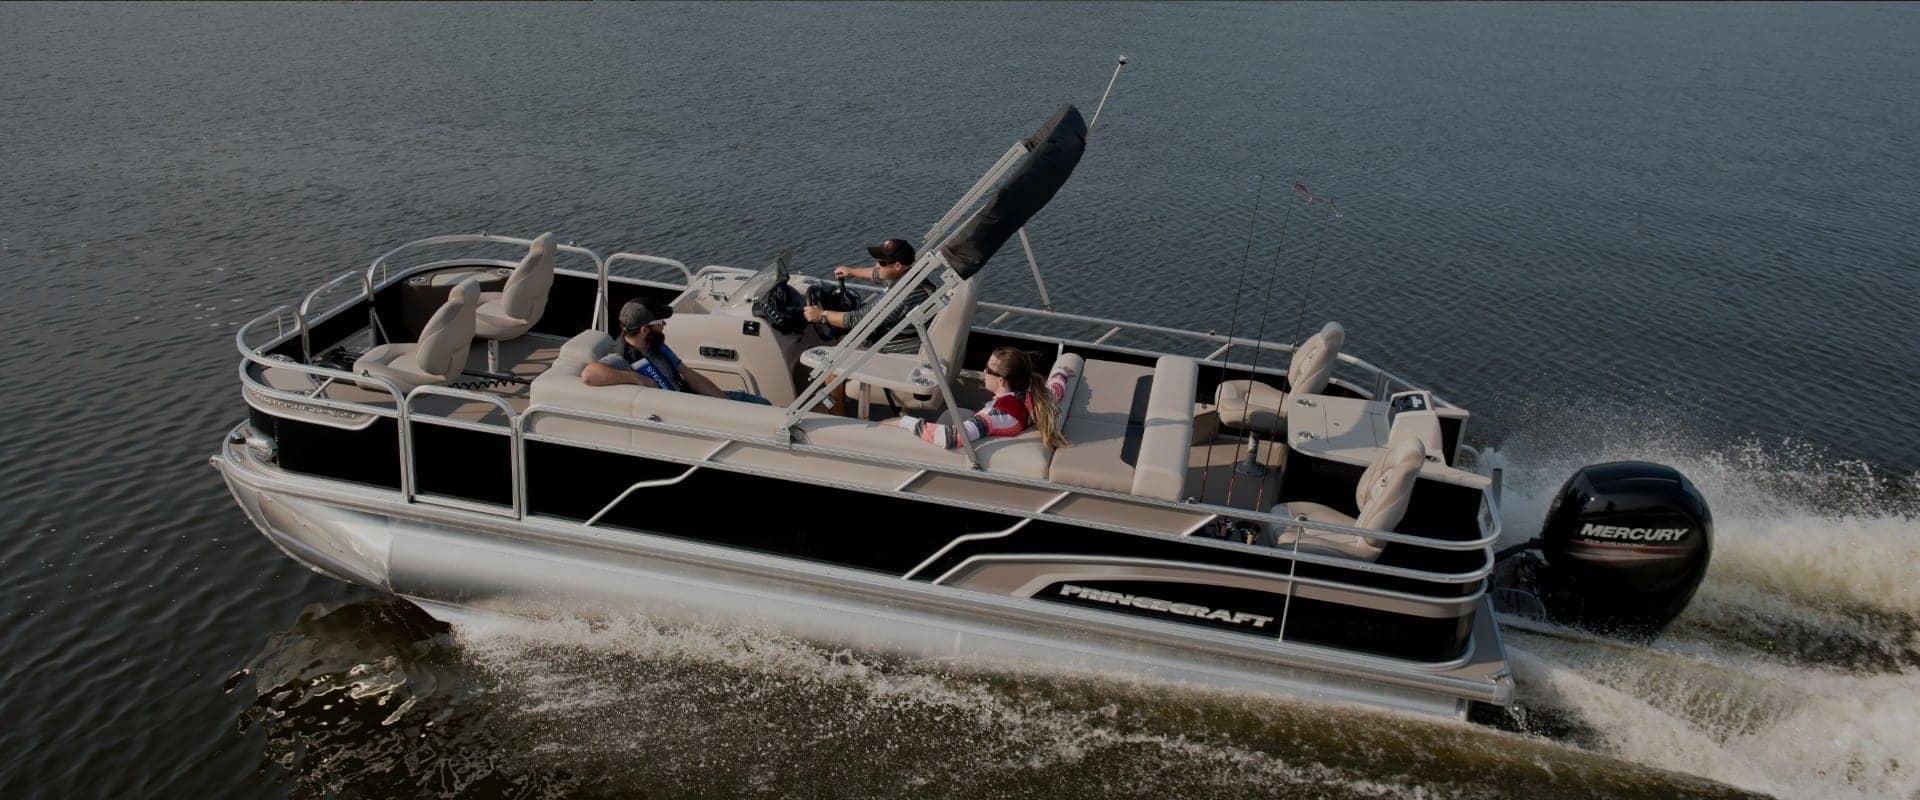 cruise encore marine dsc florida dealers sales dealer bentley boats pontoon